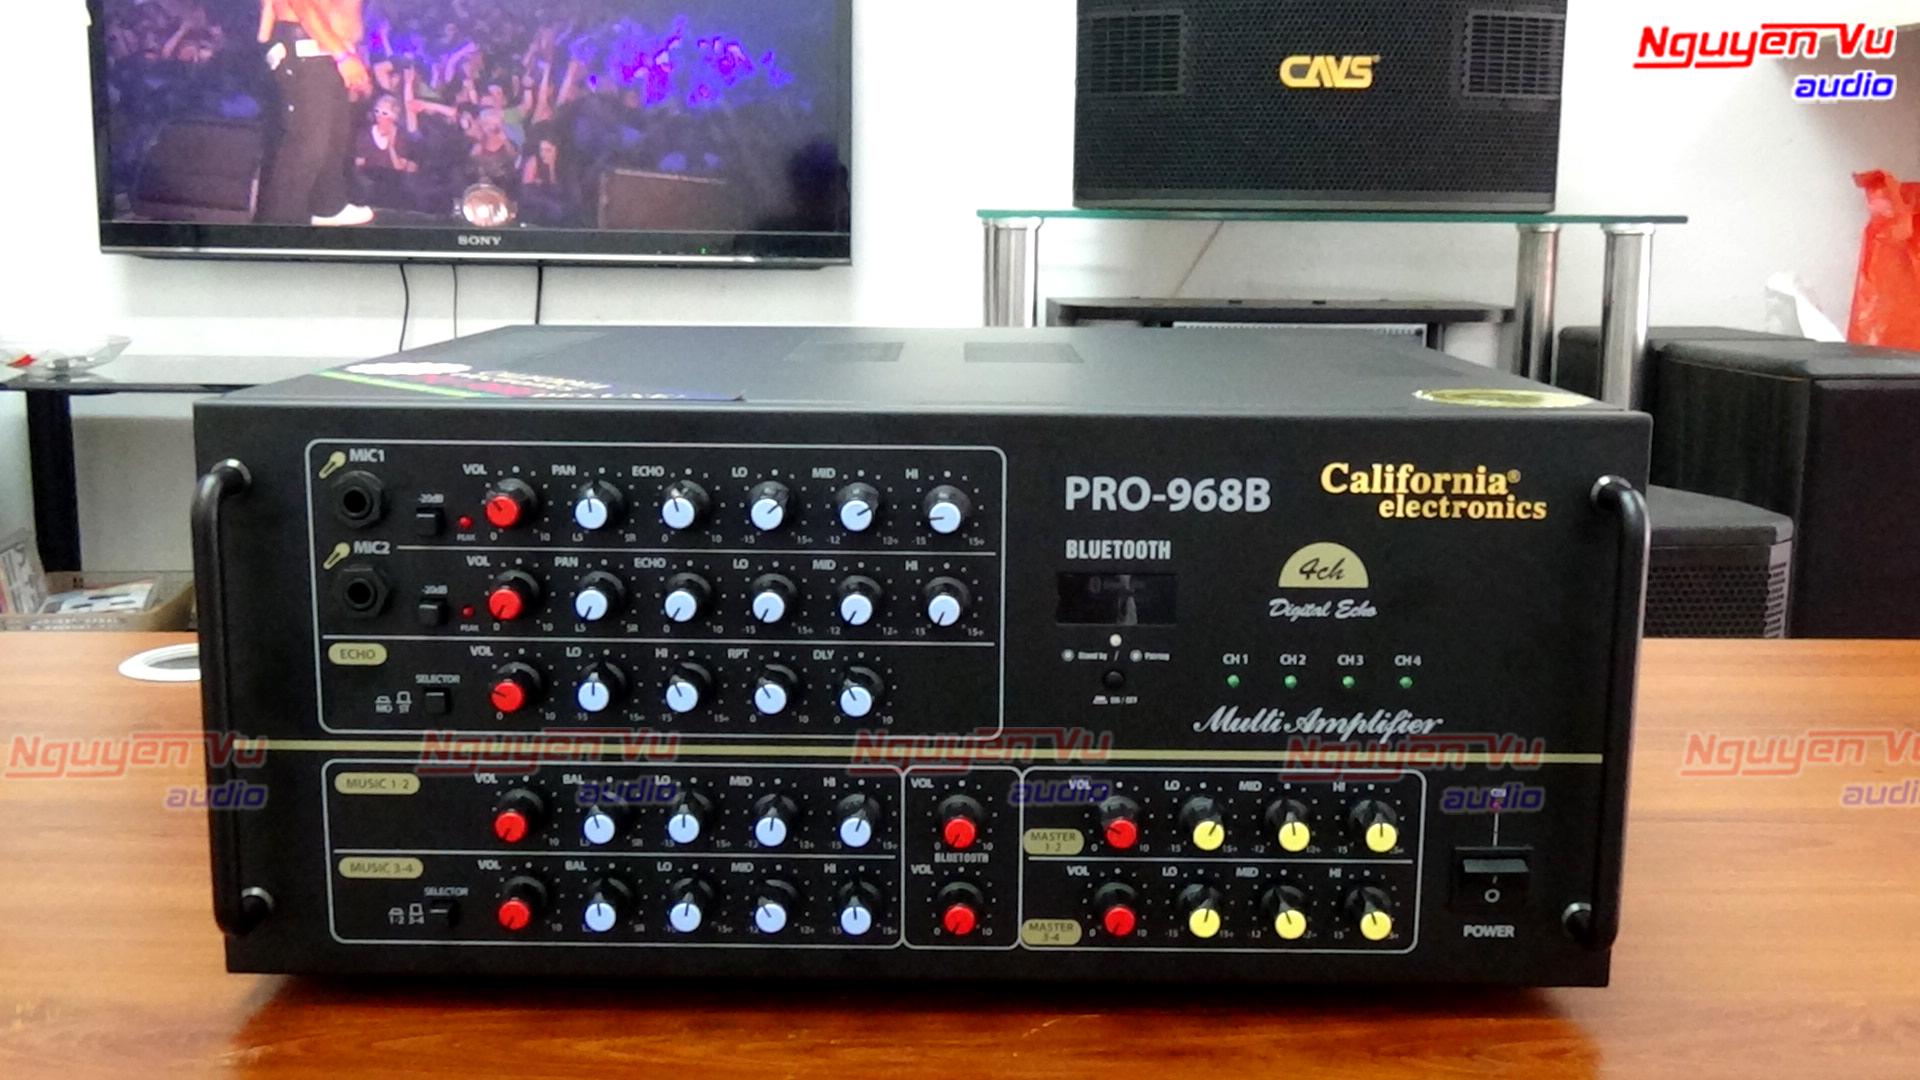 Amply california Pro 968B Bluetooth